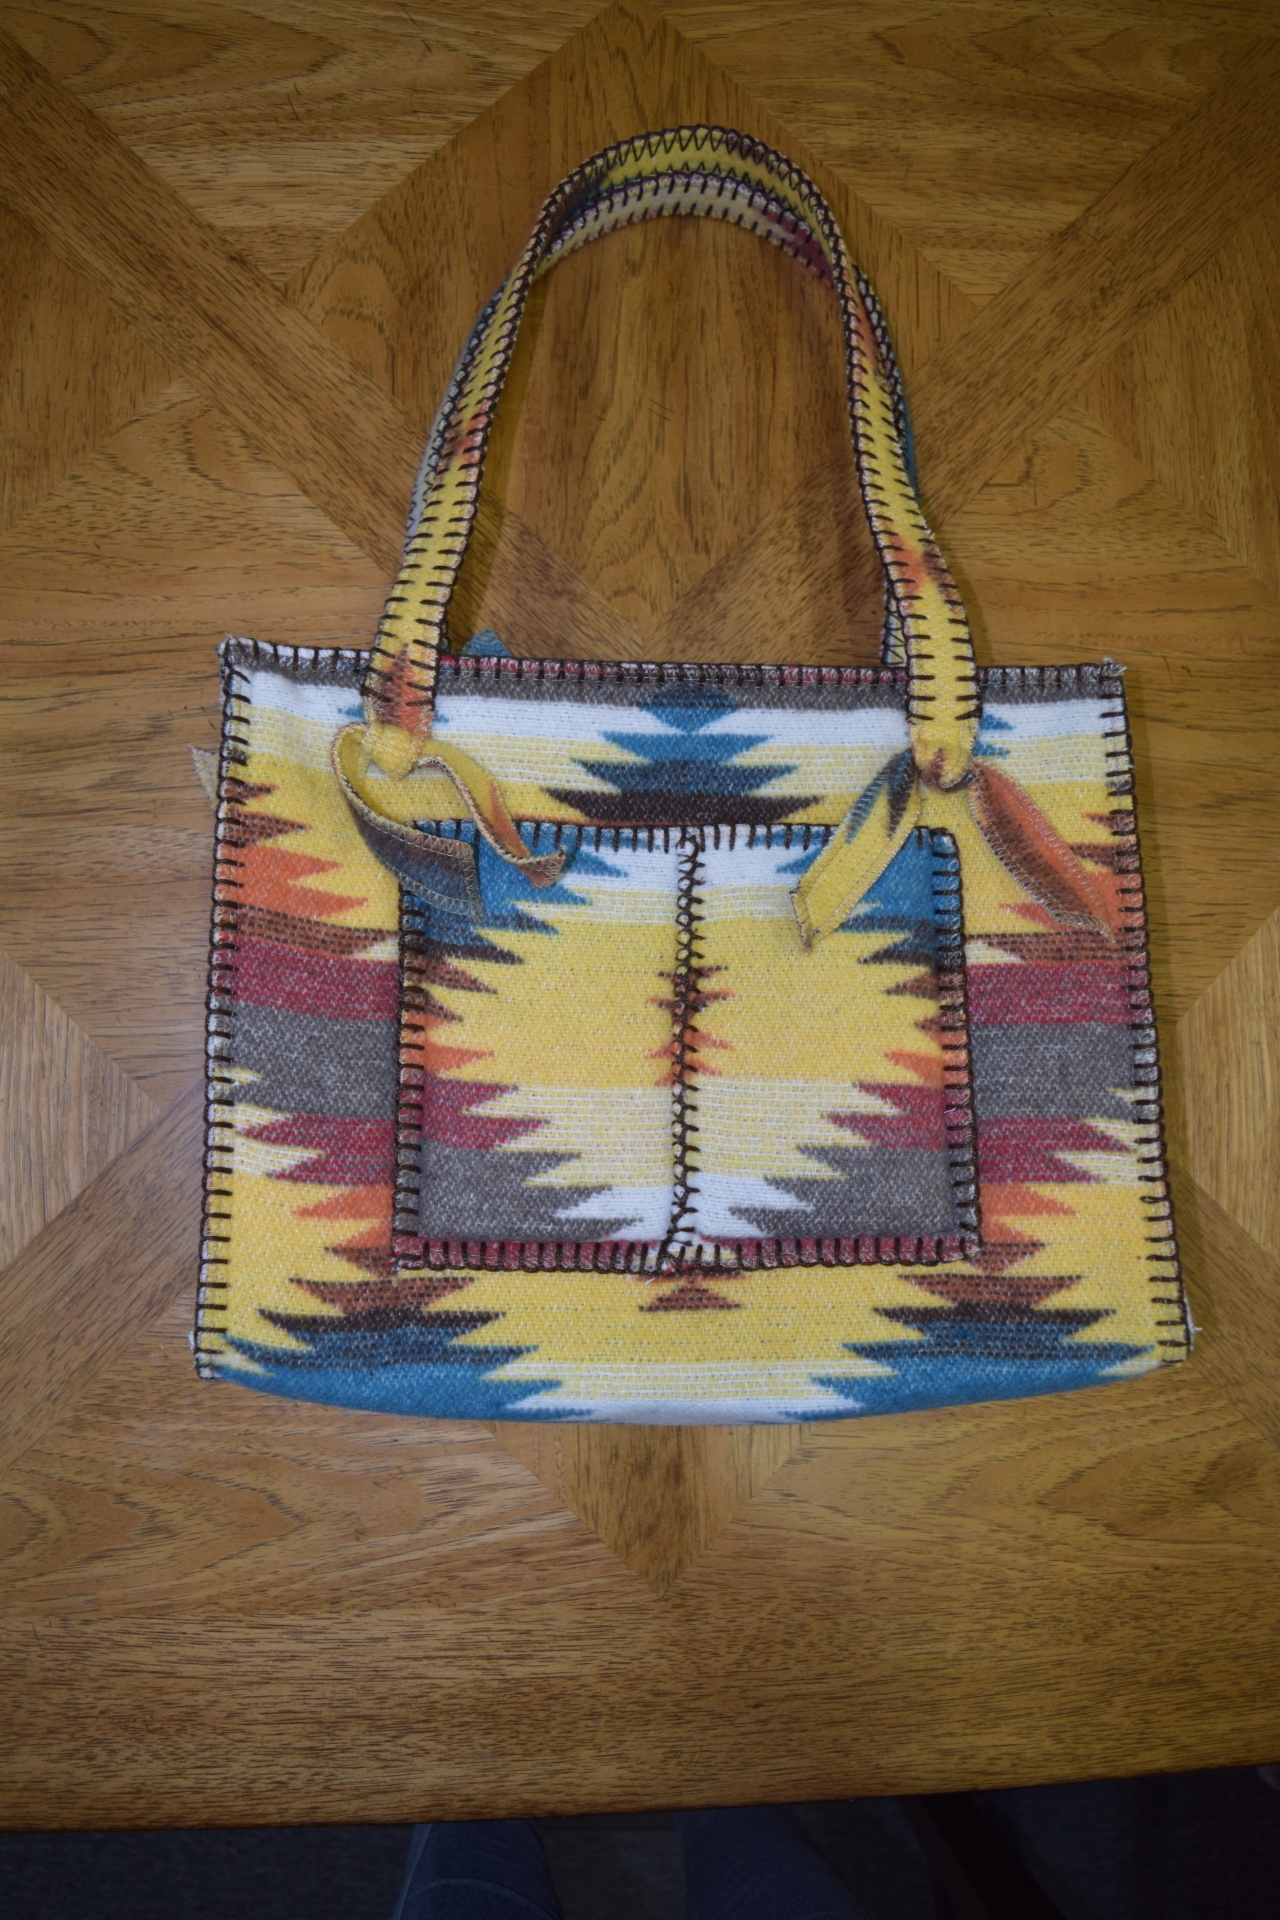 #B10SD - SUNNY DAZE POCKET ZIP BAG - $99.95